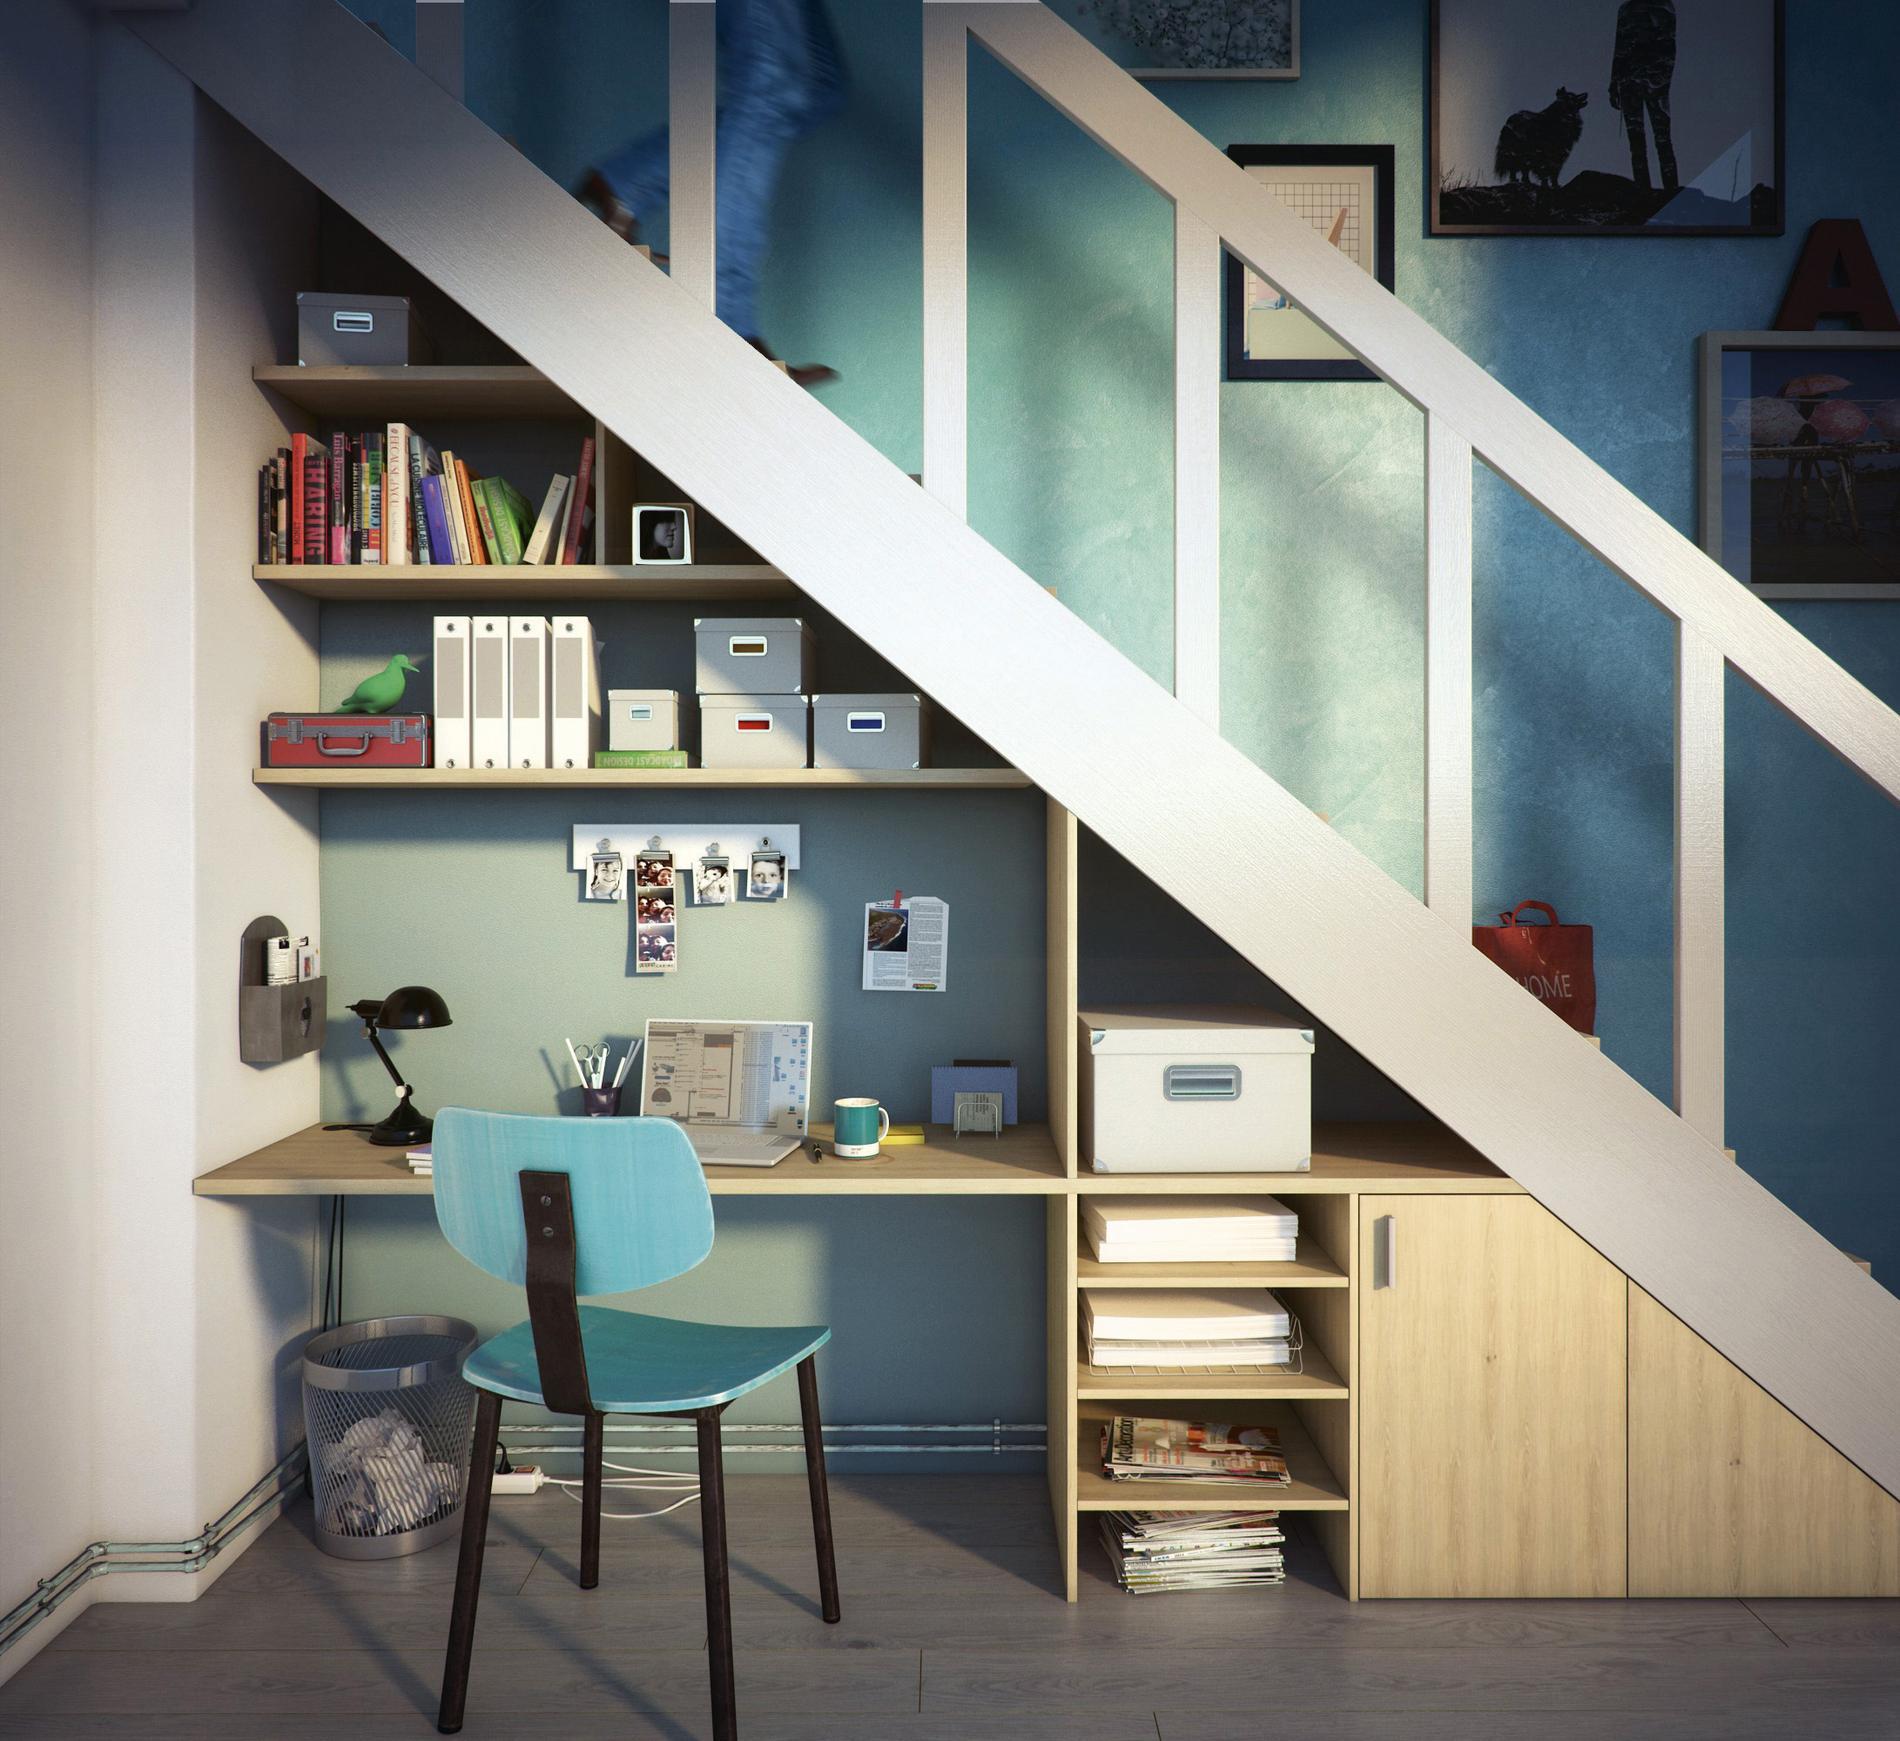 cinq astuces pour optimiser les espaces atypiques madame. Black Bedroom Furniture Sets. Home Design Ideas